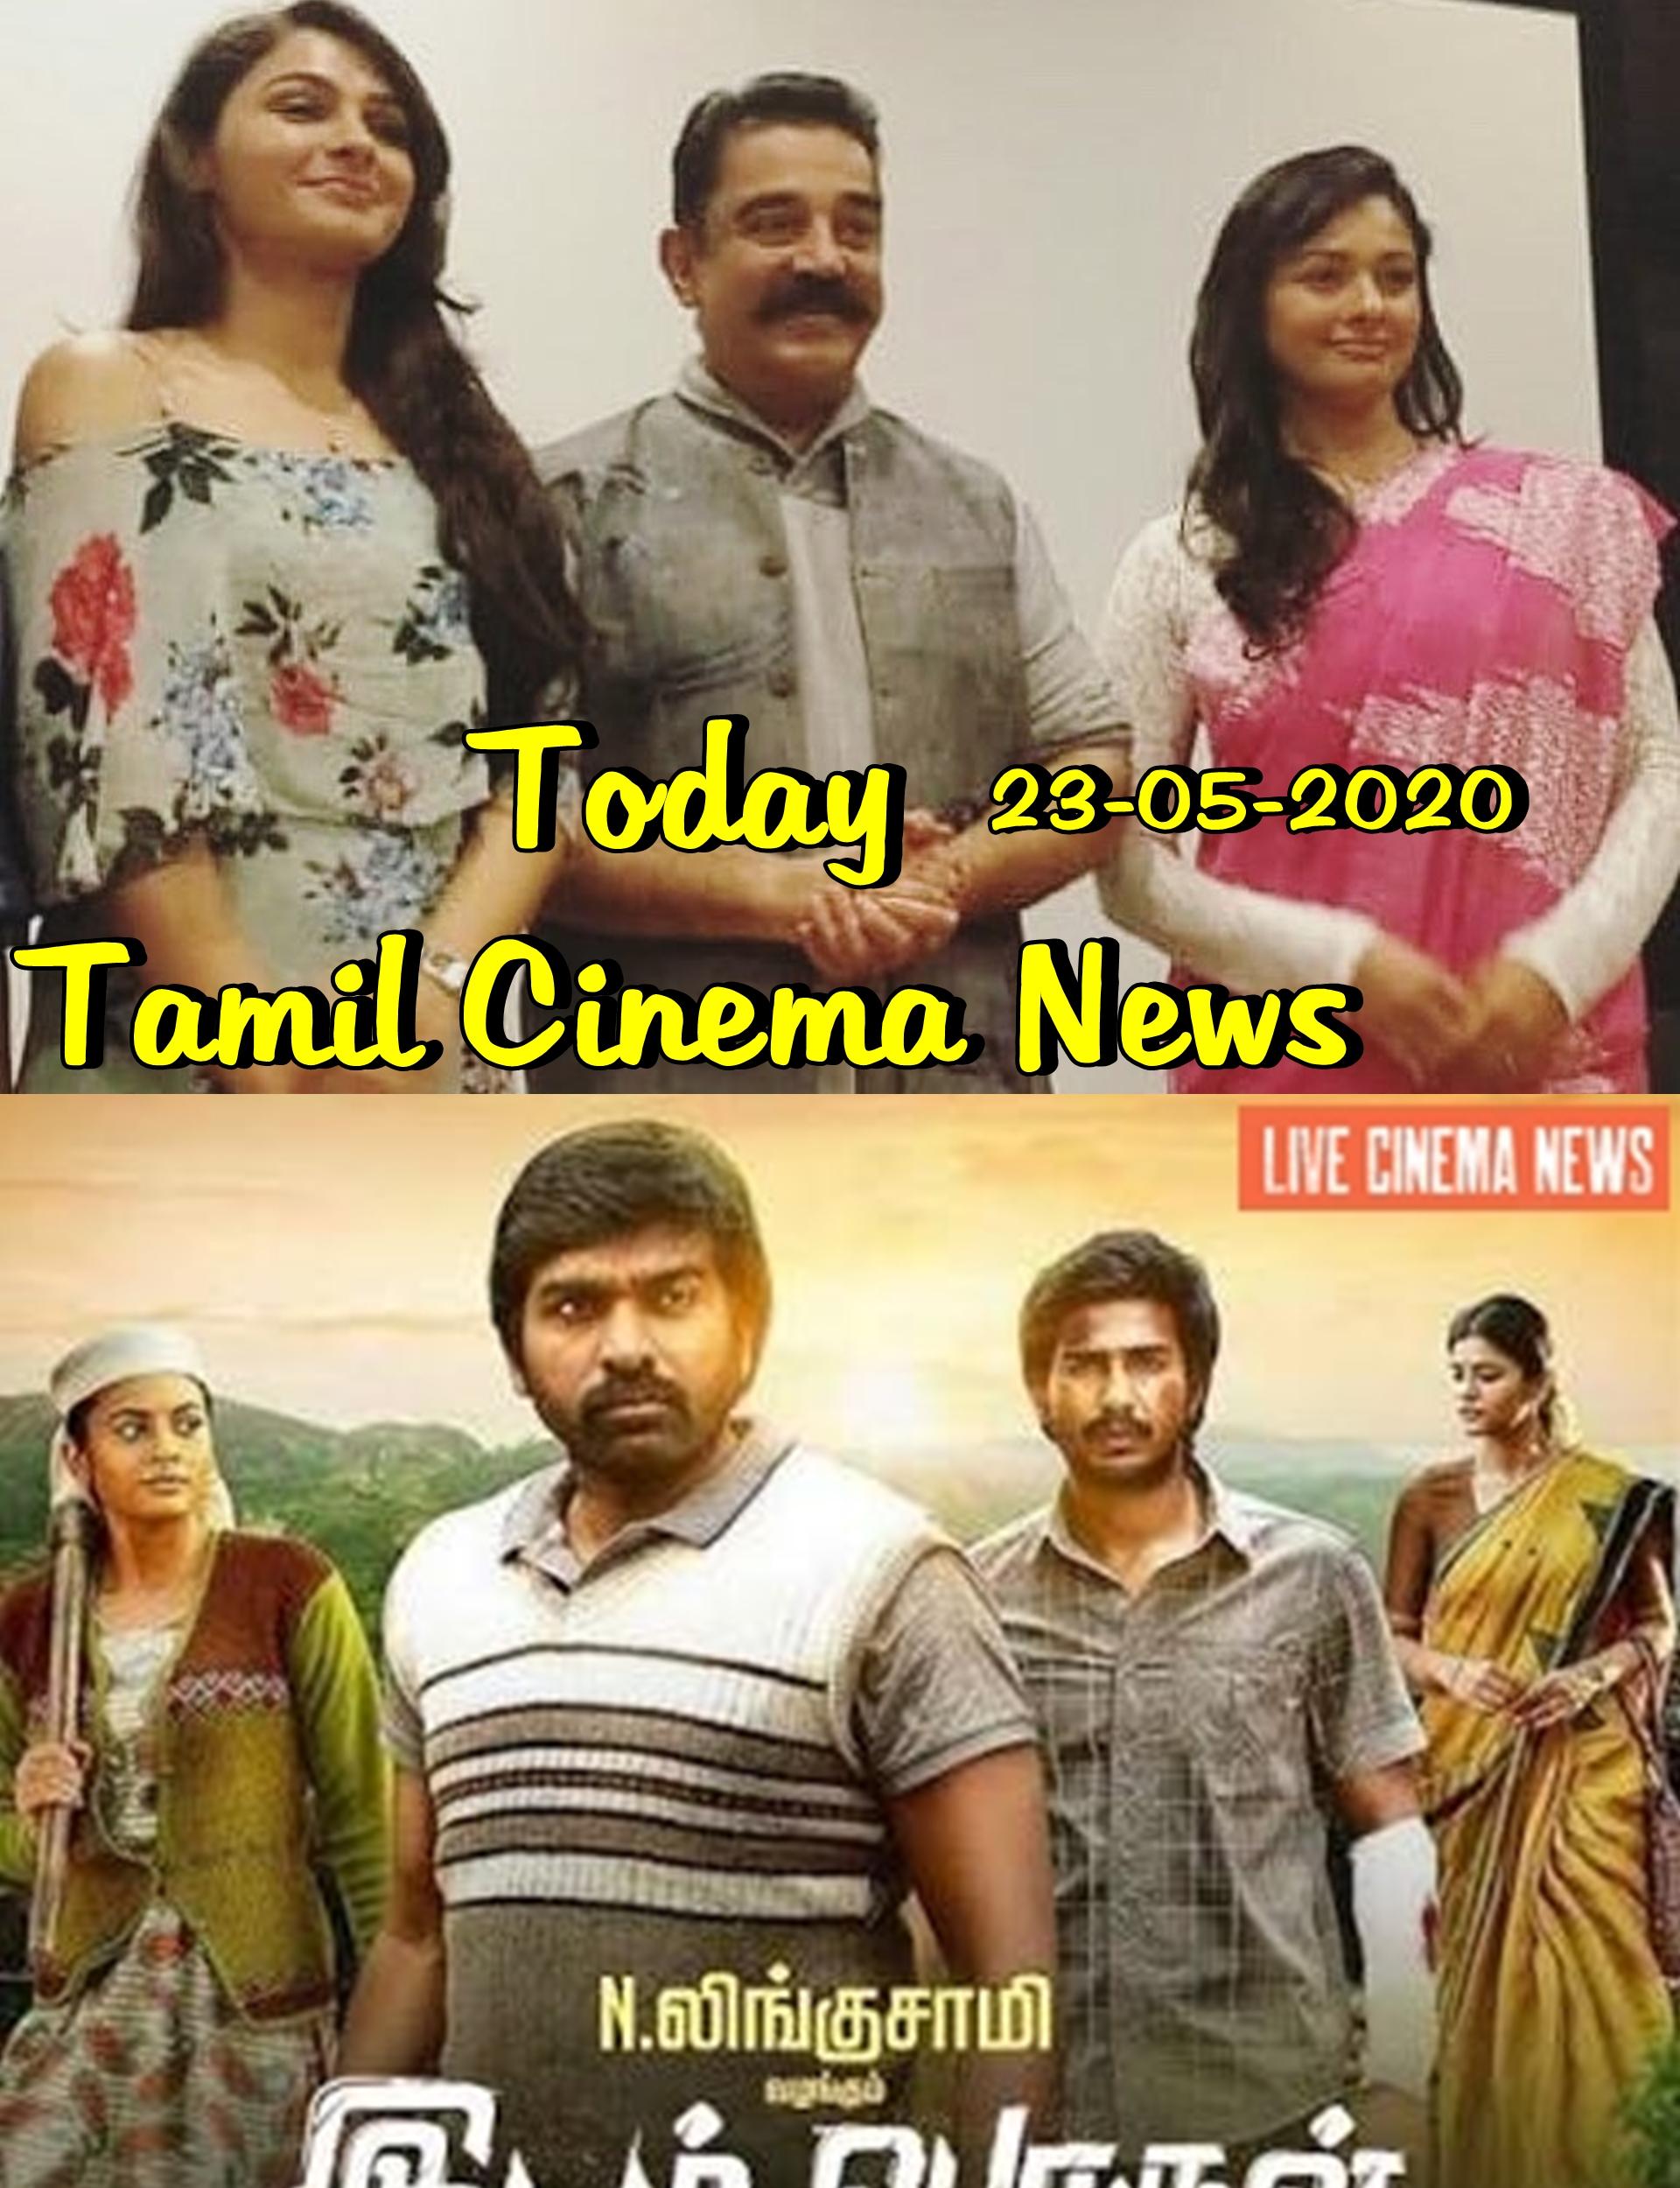 Today Tamil Cinema News 23-05-2020